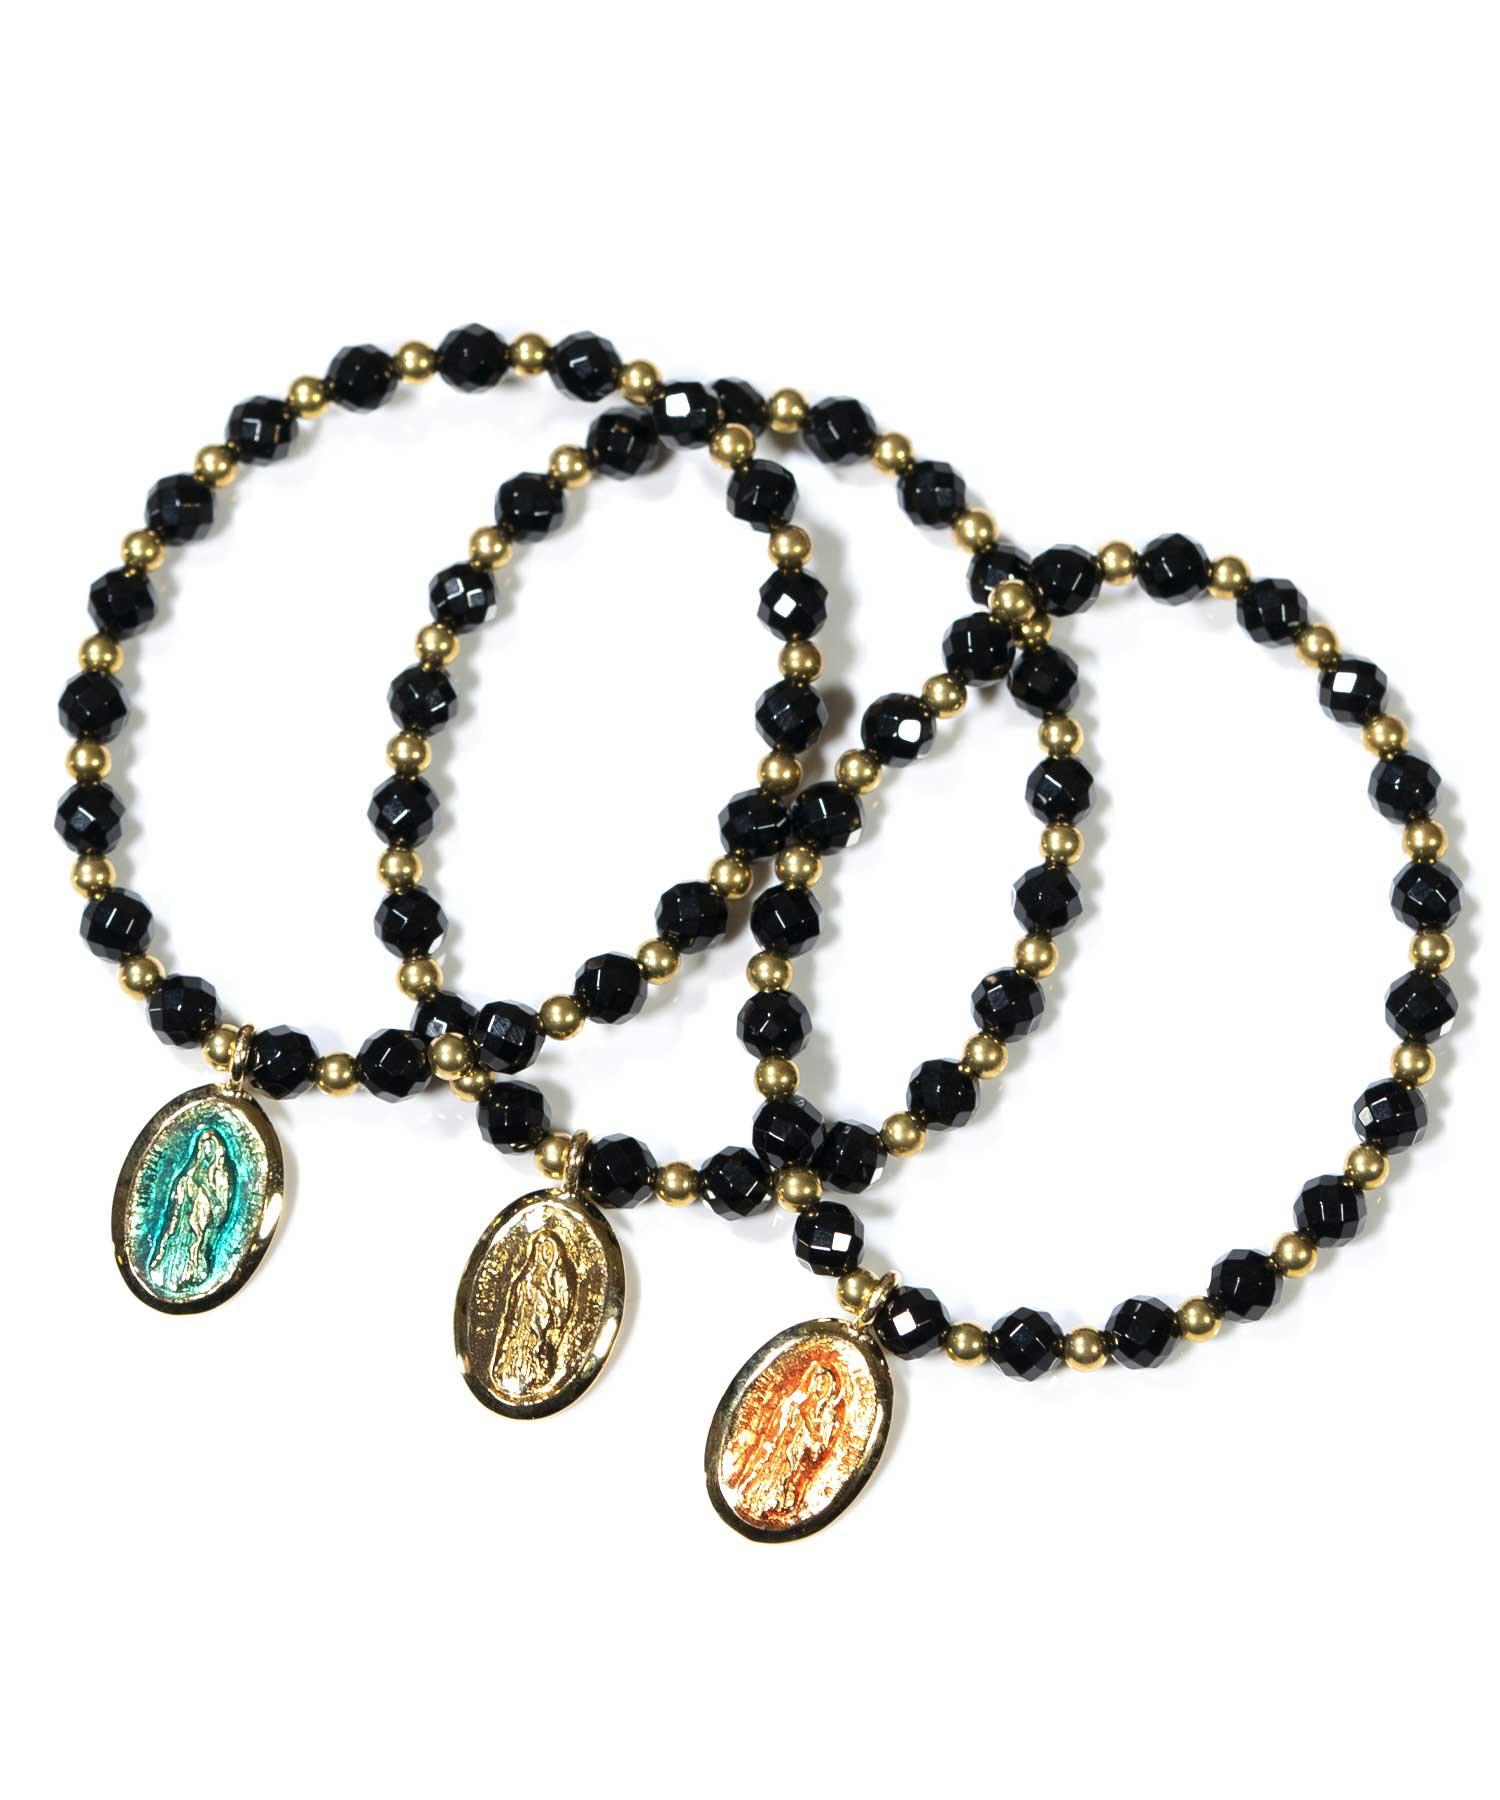 【SHR 10th】★受注生産予約 SAHRIVAR(シャフリーヴァル)Enameled Maria Beads BR 10TH ANV